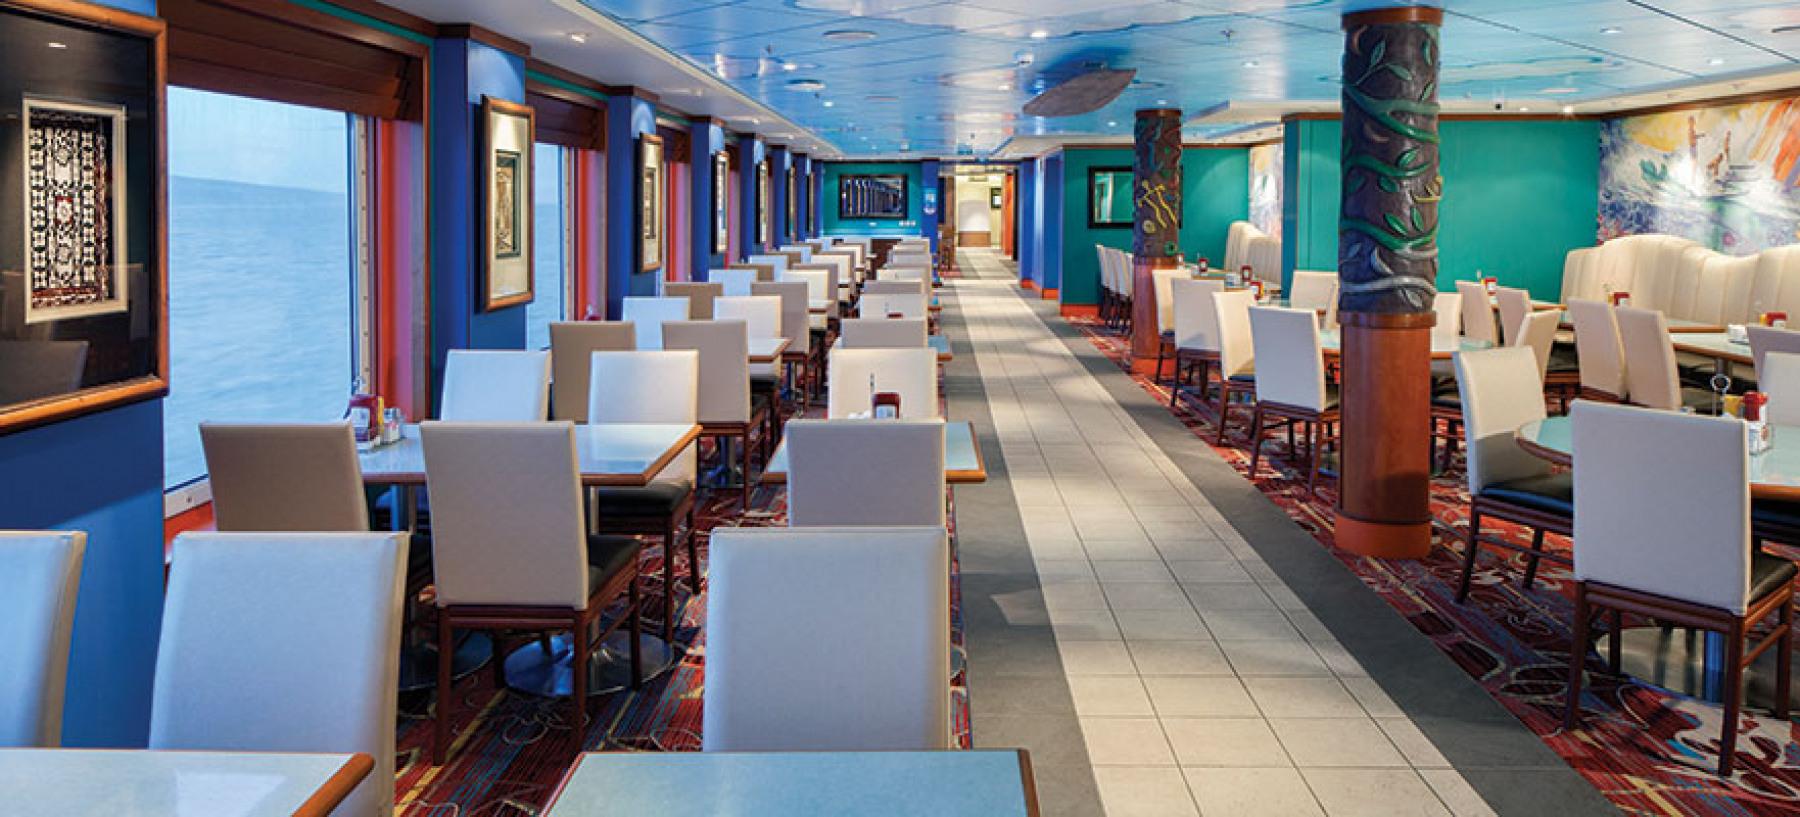 Norwegian Cruise Line Pride of America Interior aloha.jpg